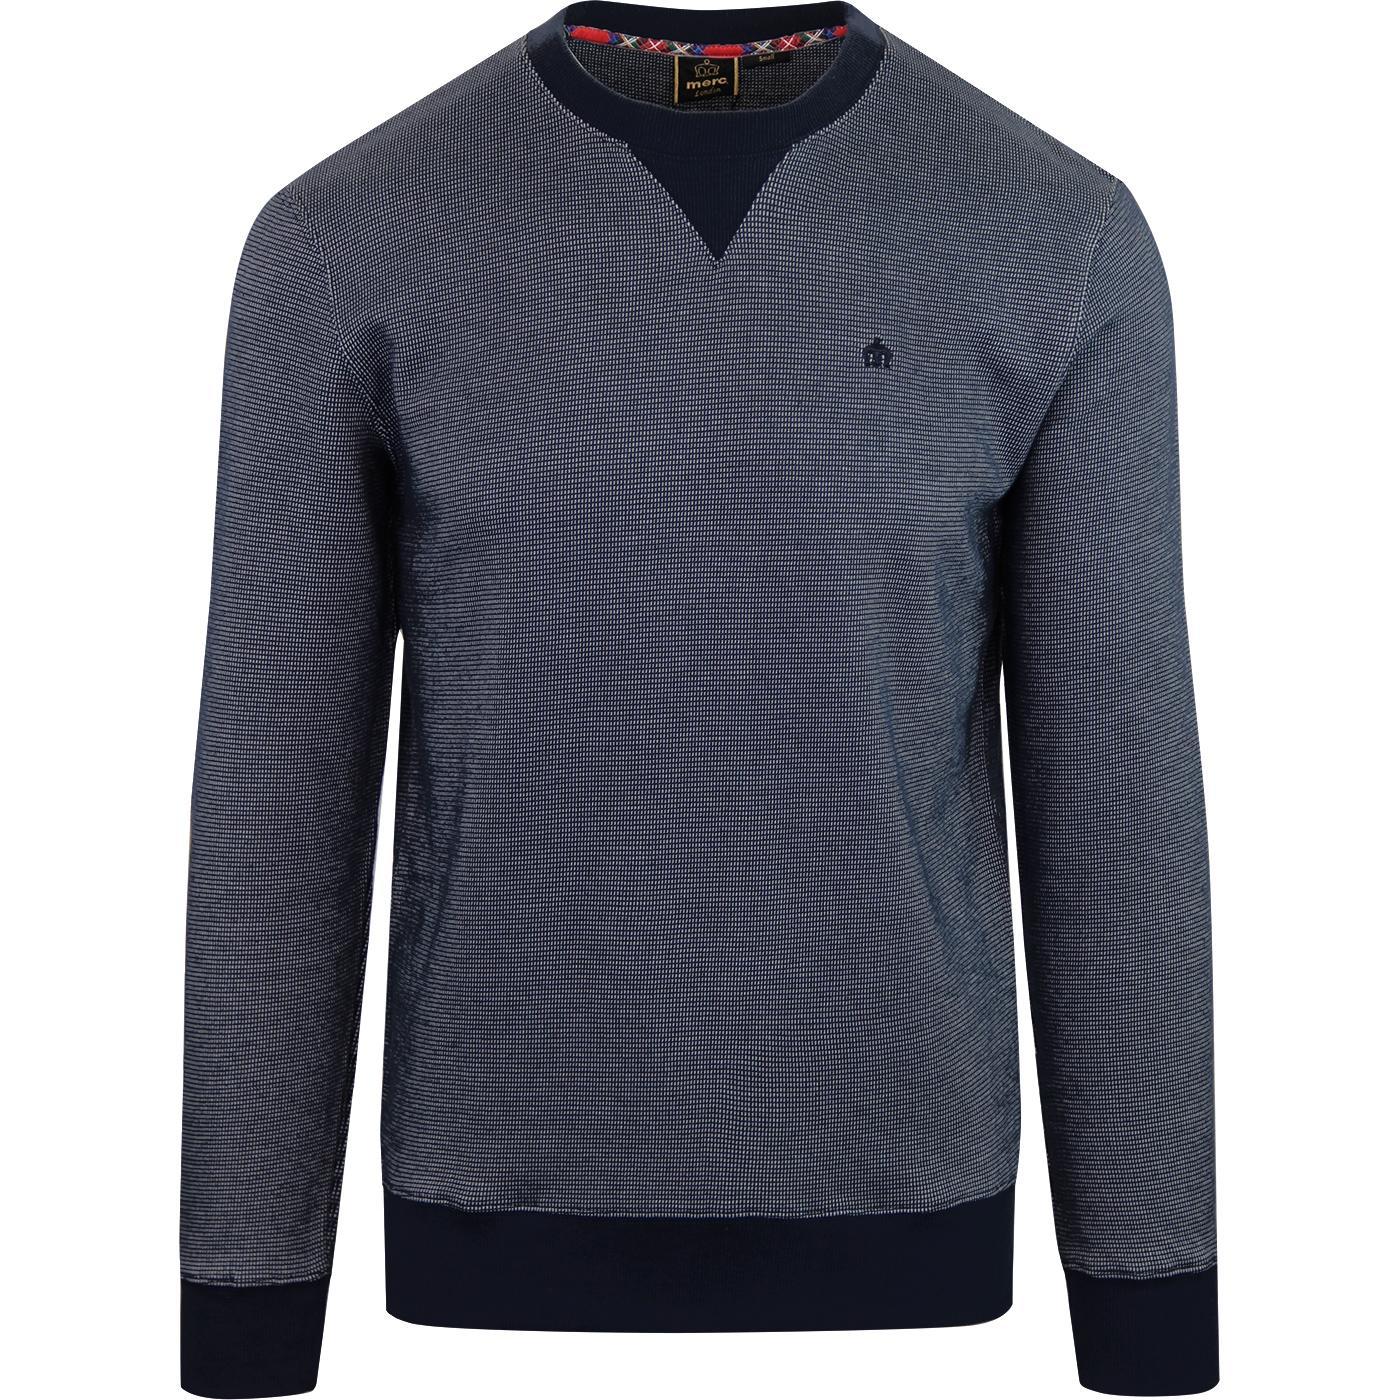 Shelton MERC Retro Mod Birdseye Crew Sweatshirt